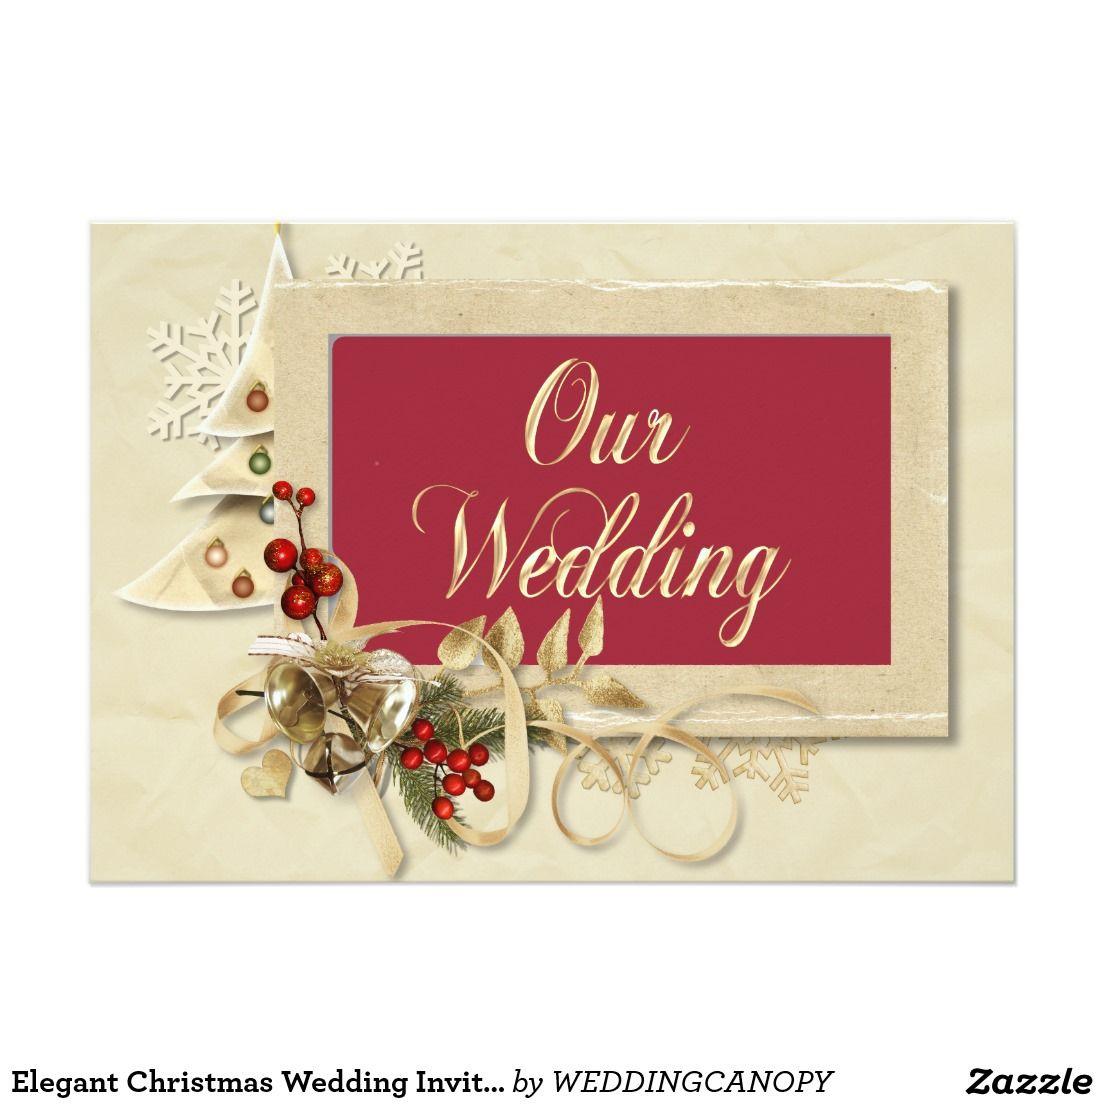 Elegant Christmas Wedding Invitation With Tree | Wedding Themes ...